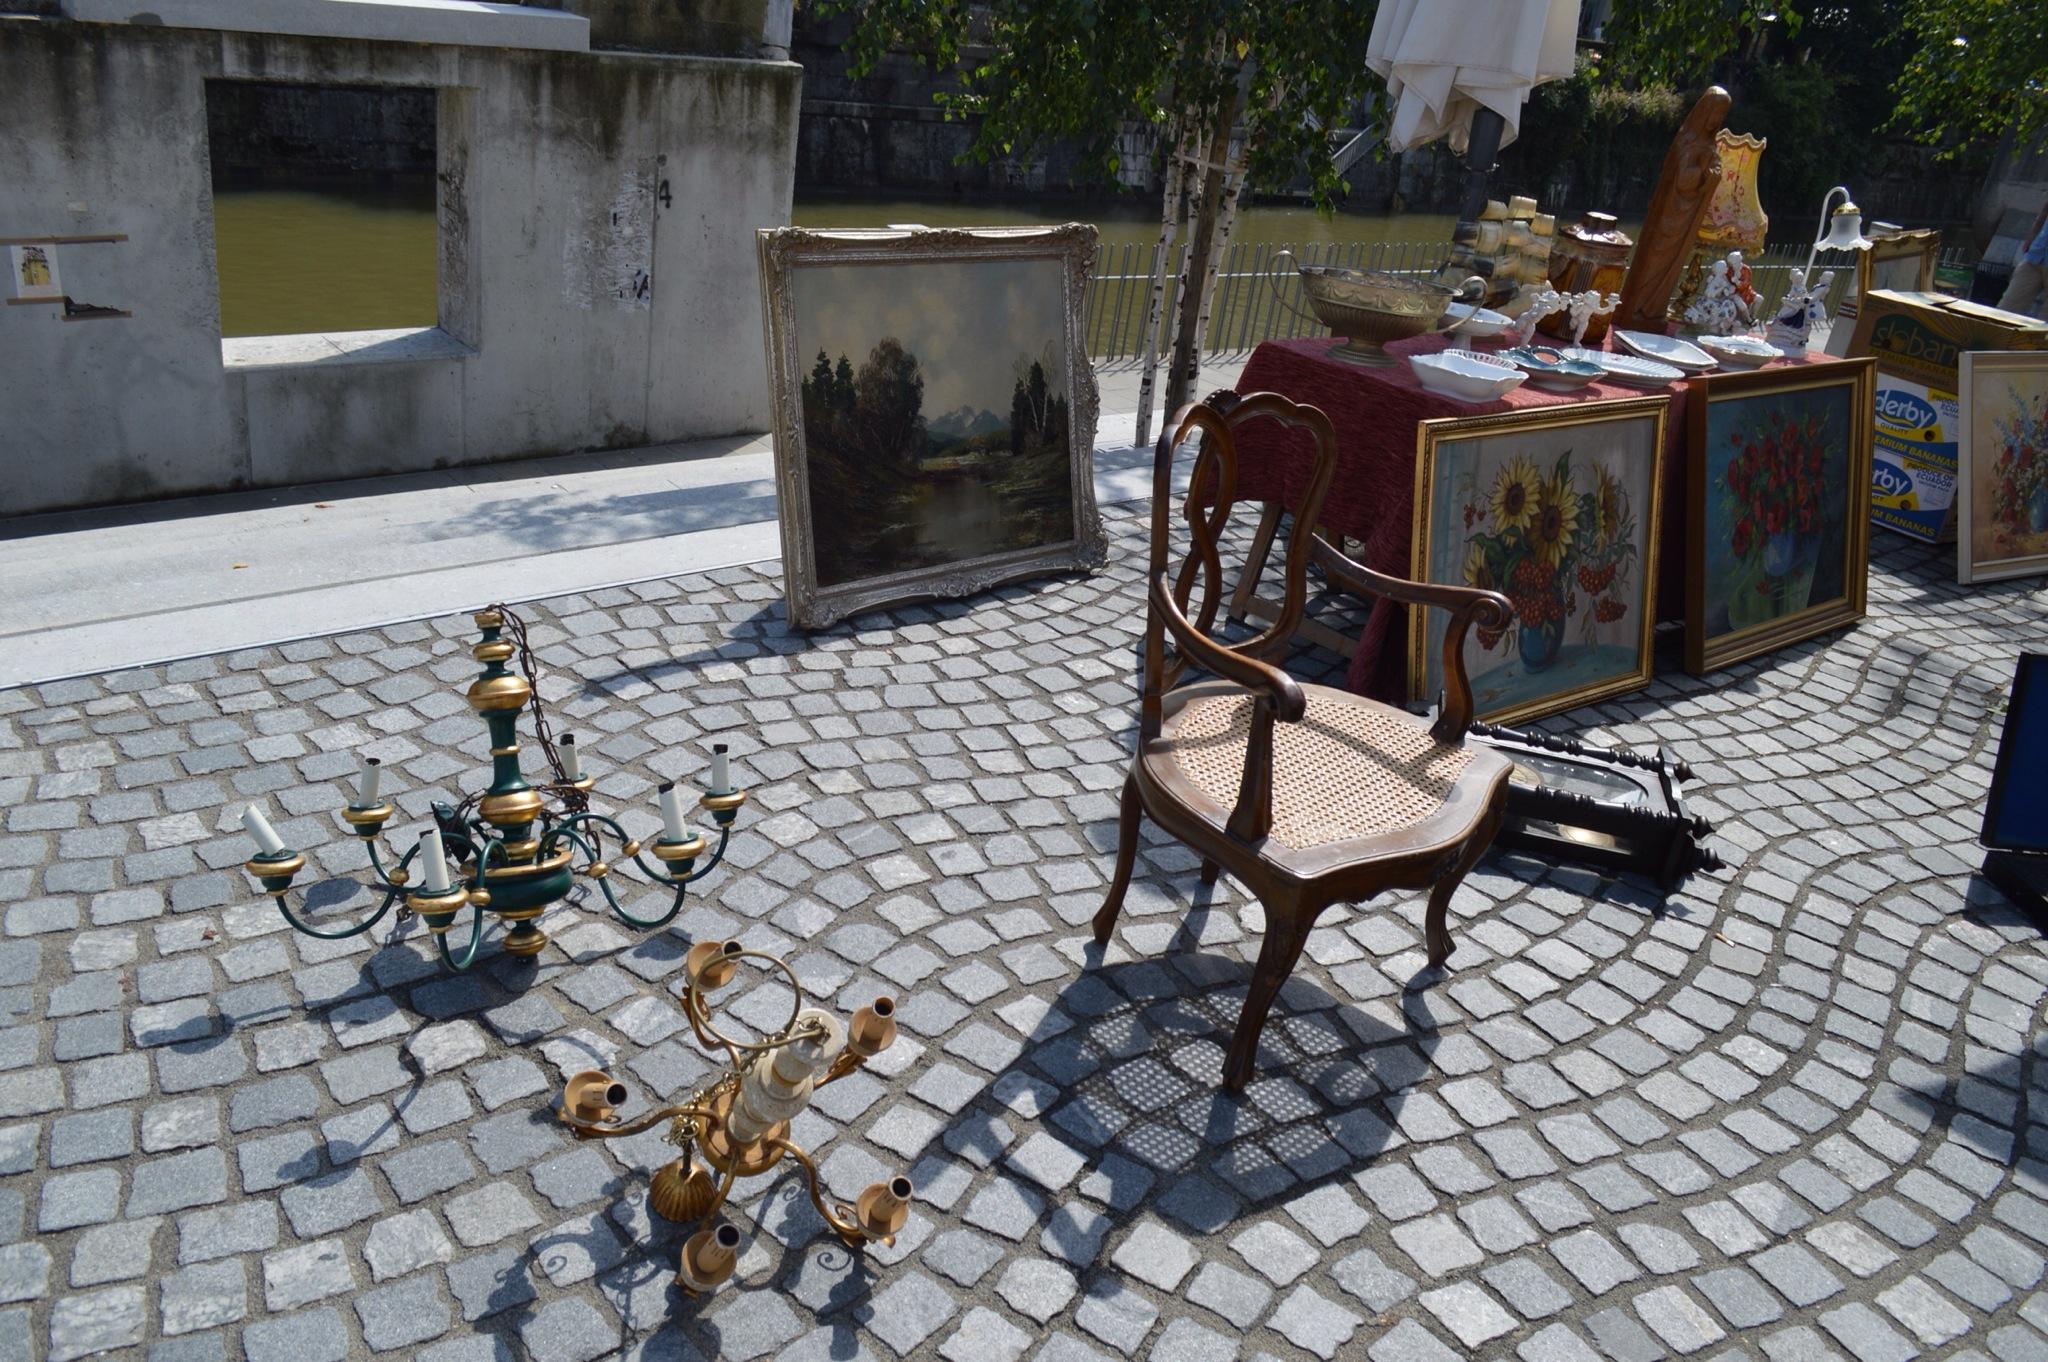 Antiquity and gastronomy, Ljubjana